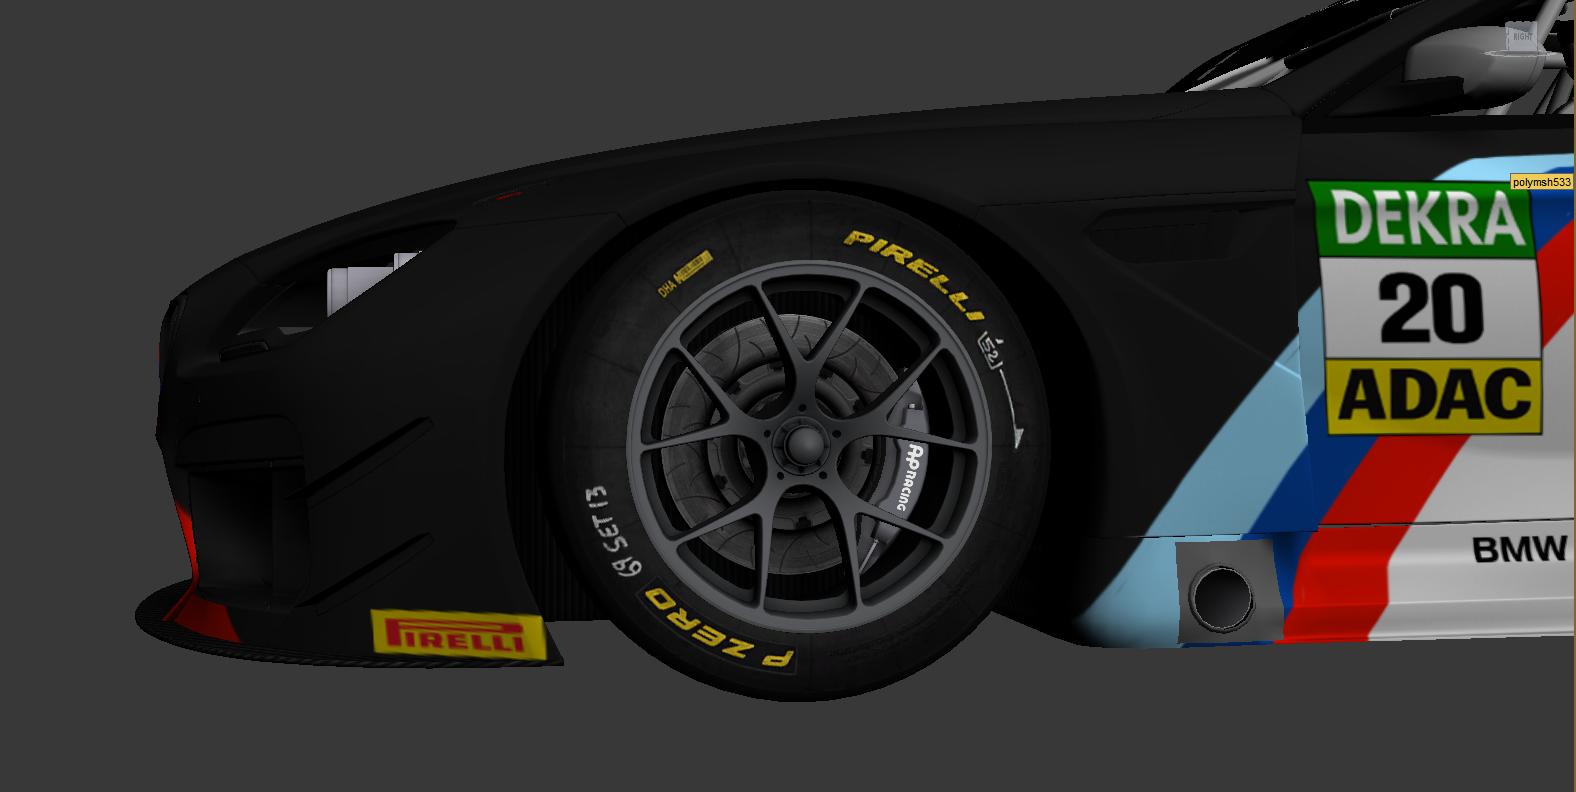 Bmw M6 Gt3 E For Rfactor 2 New Previews Virtualr Net Sim Racing News